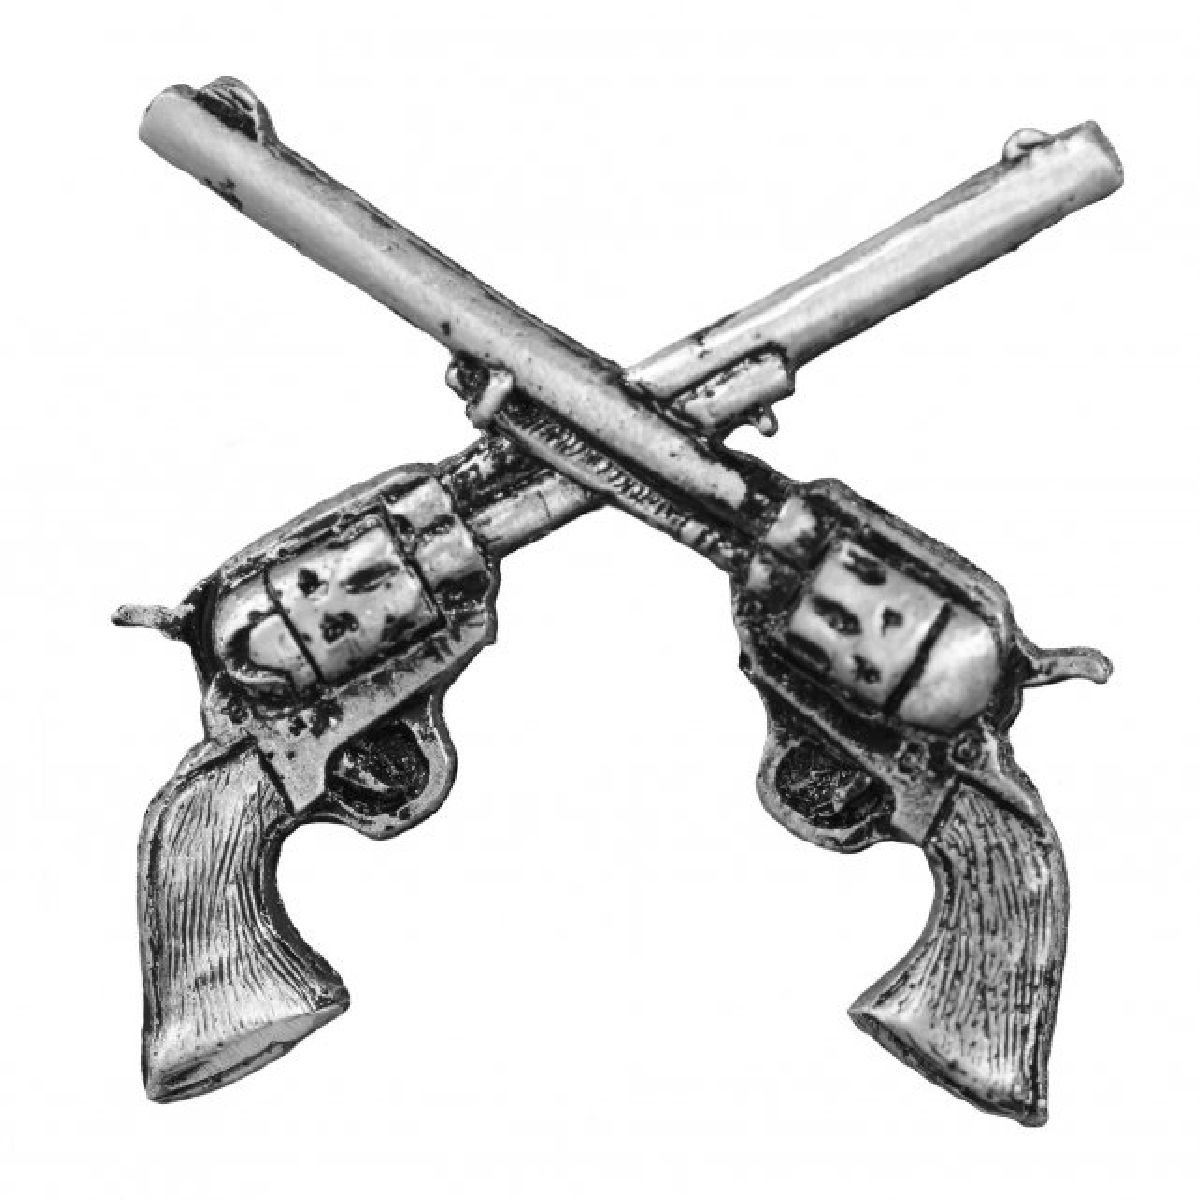 Imagini pentru revolver logo